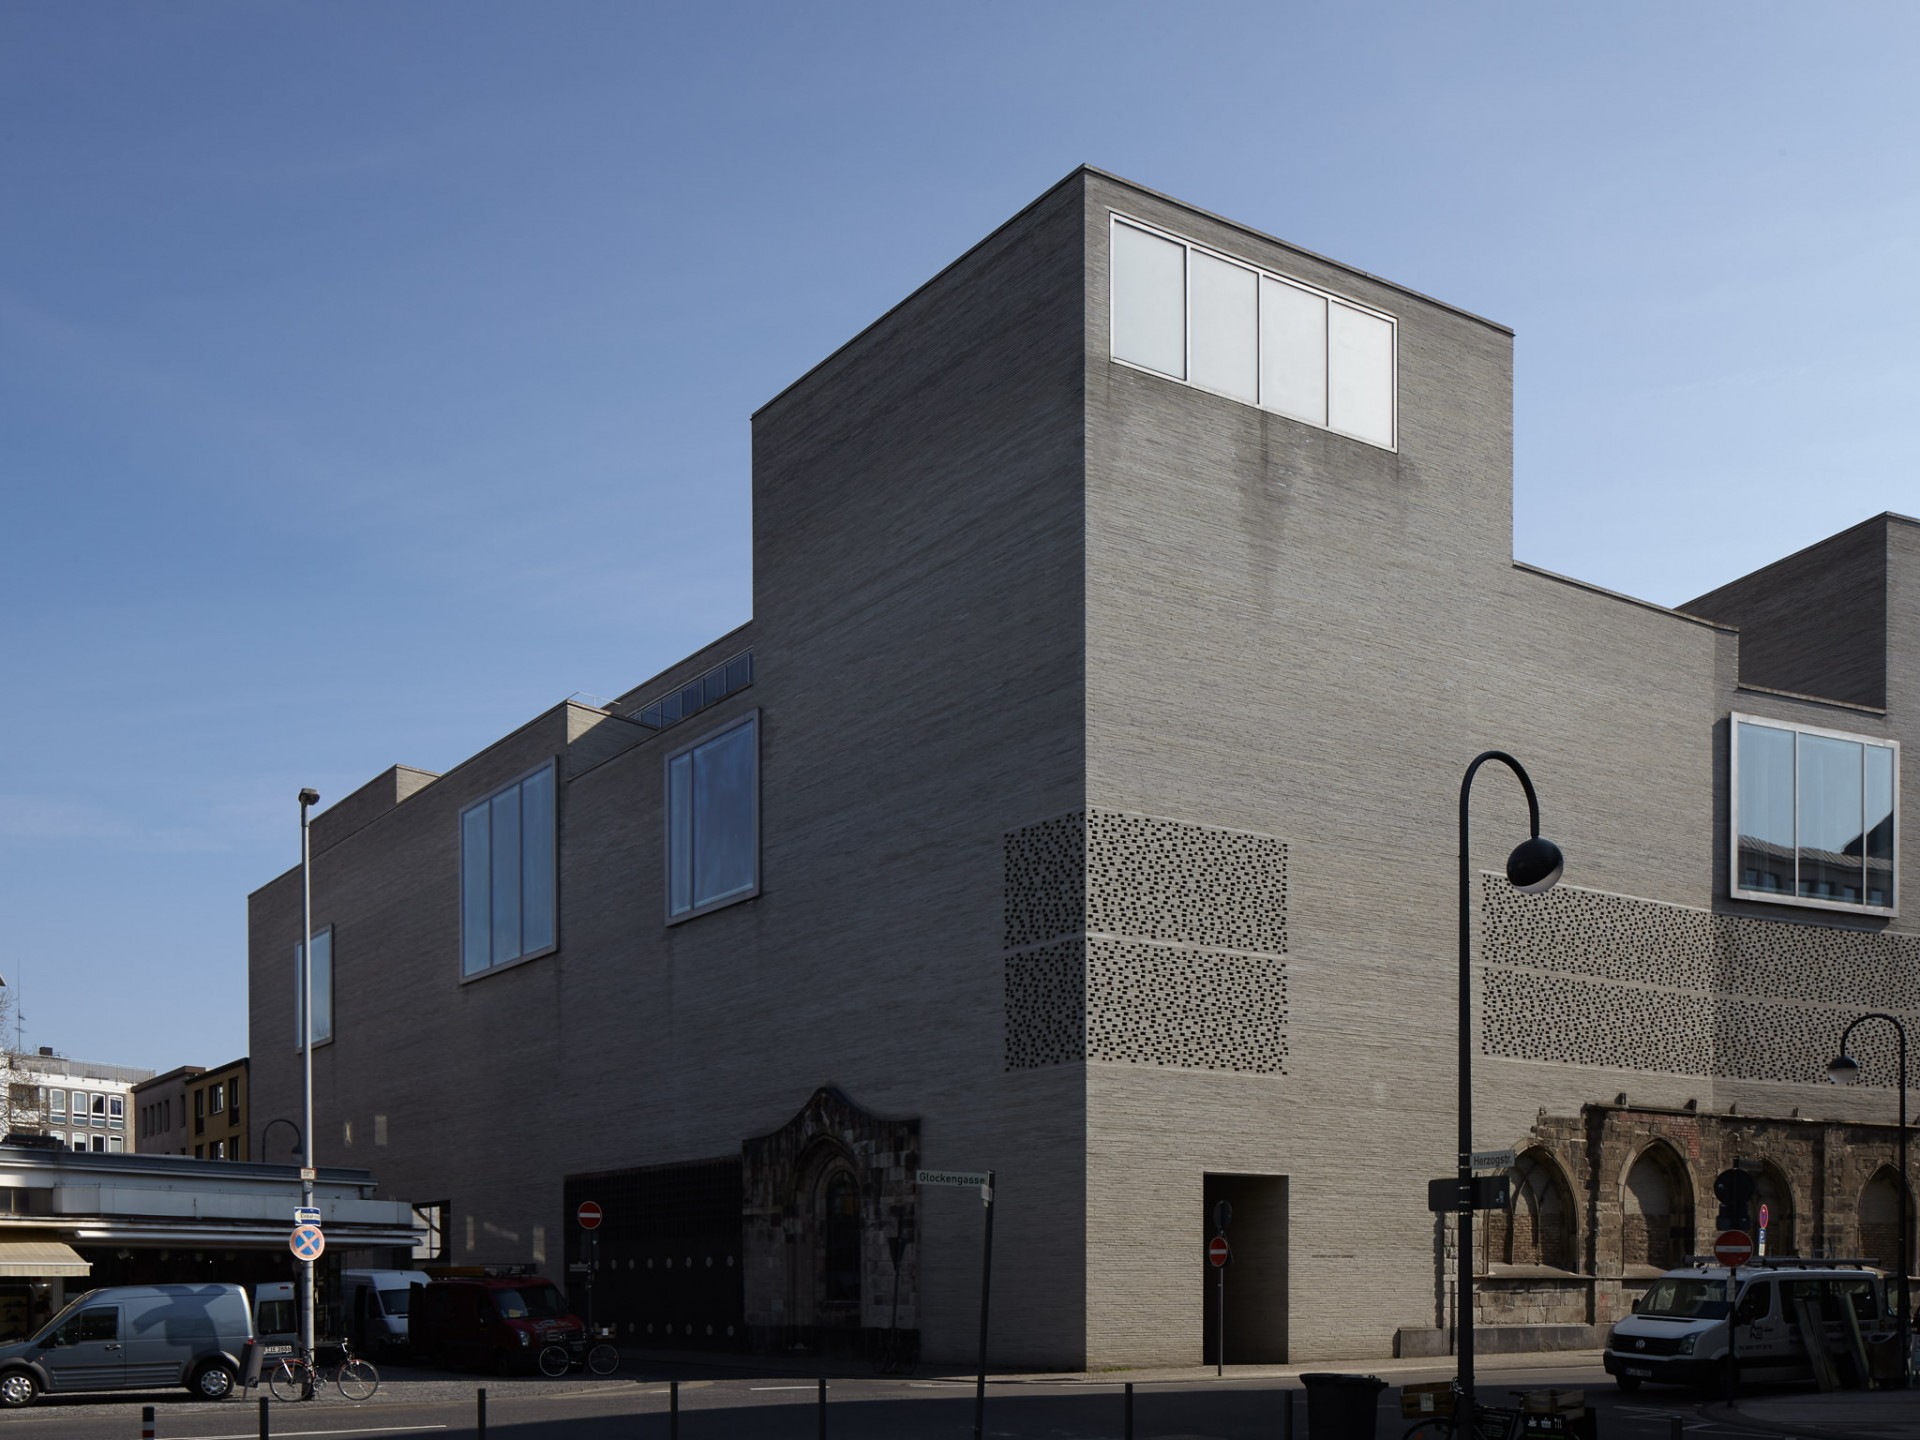 Joe Clark Architecture